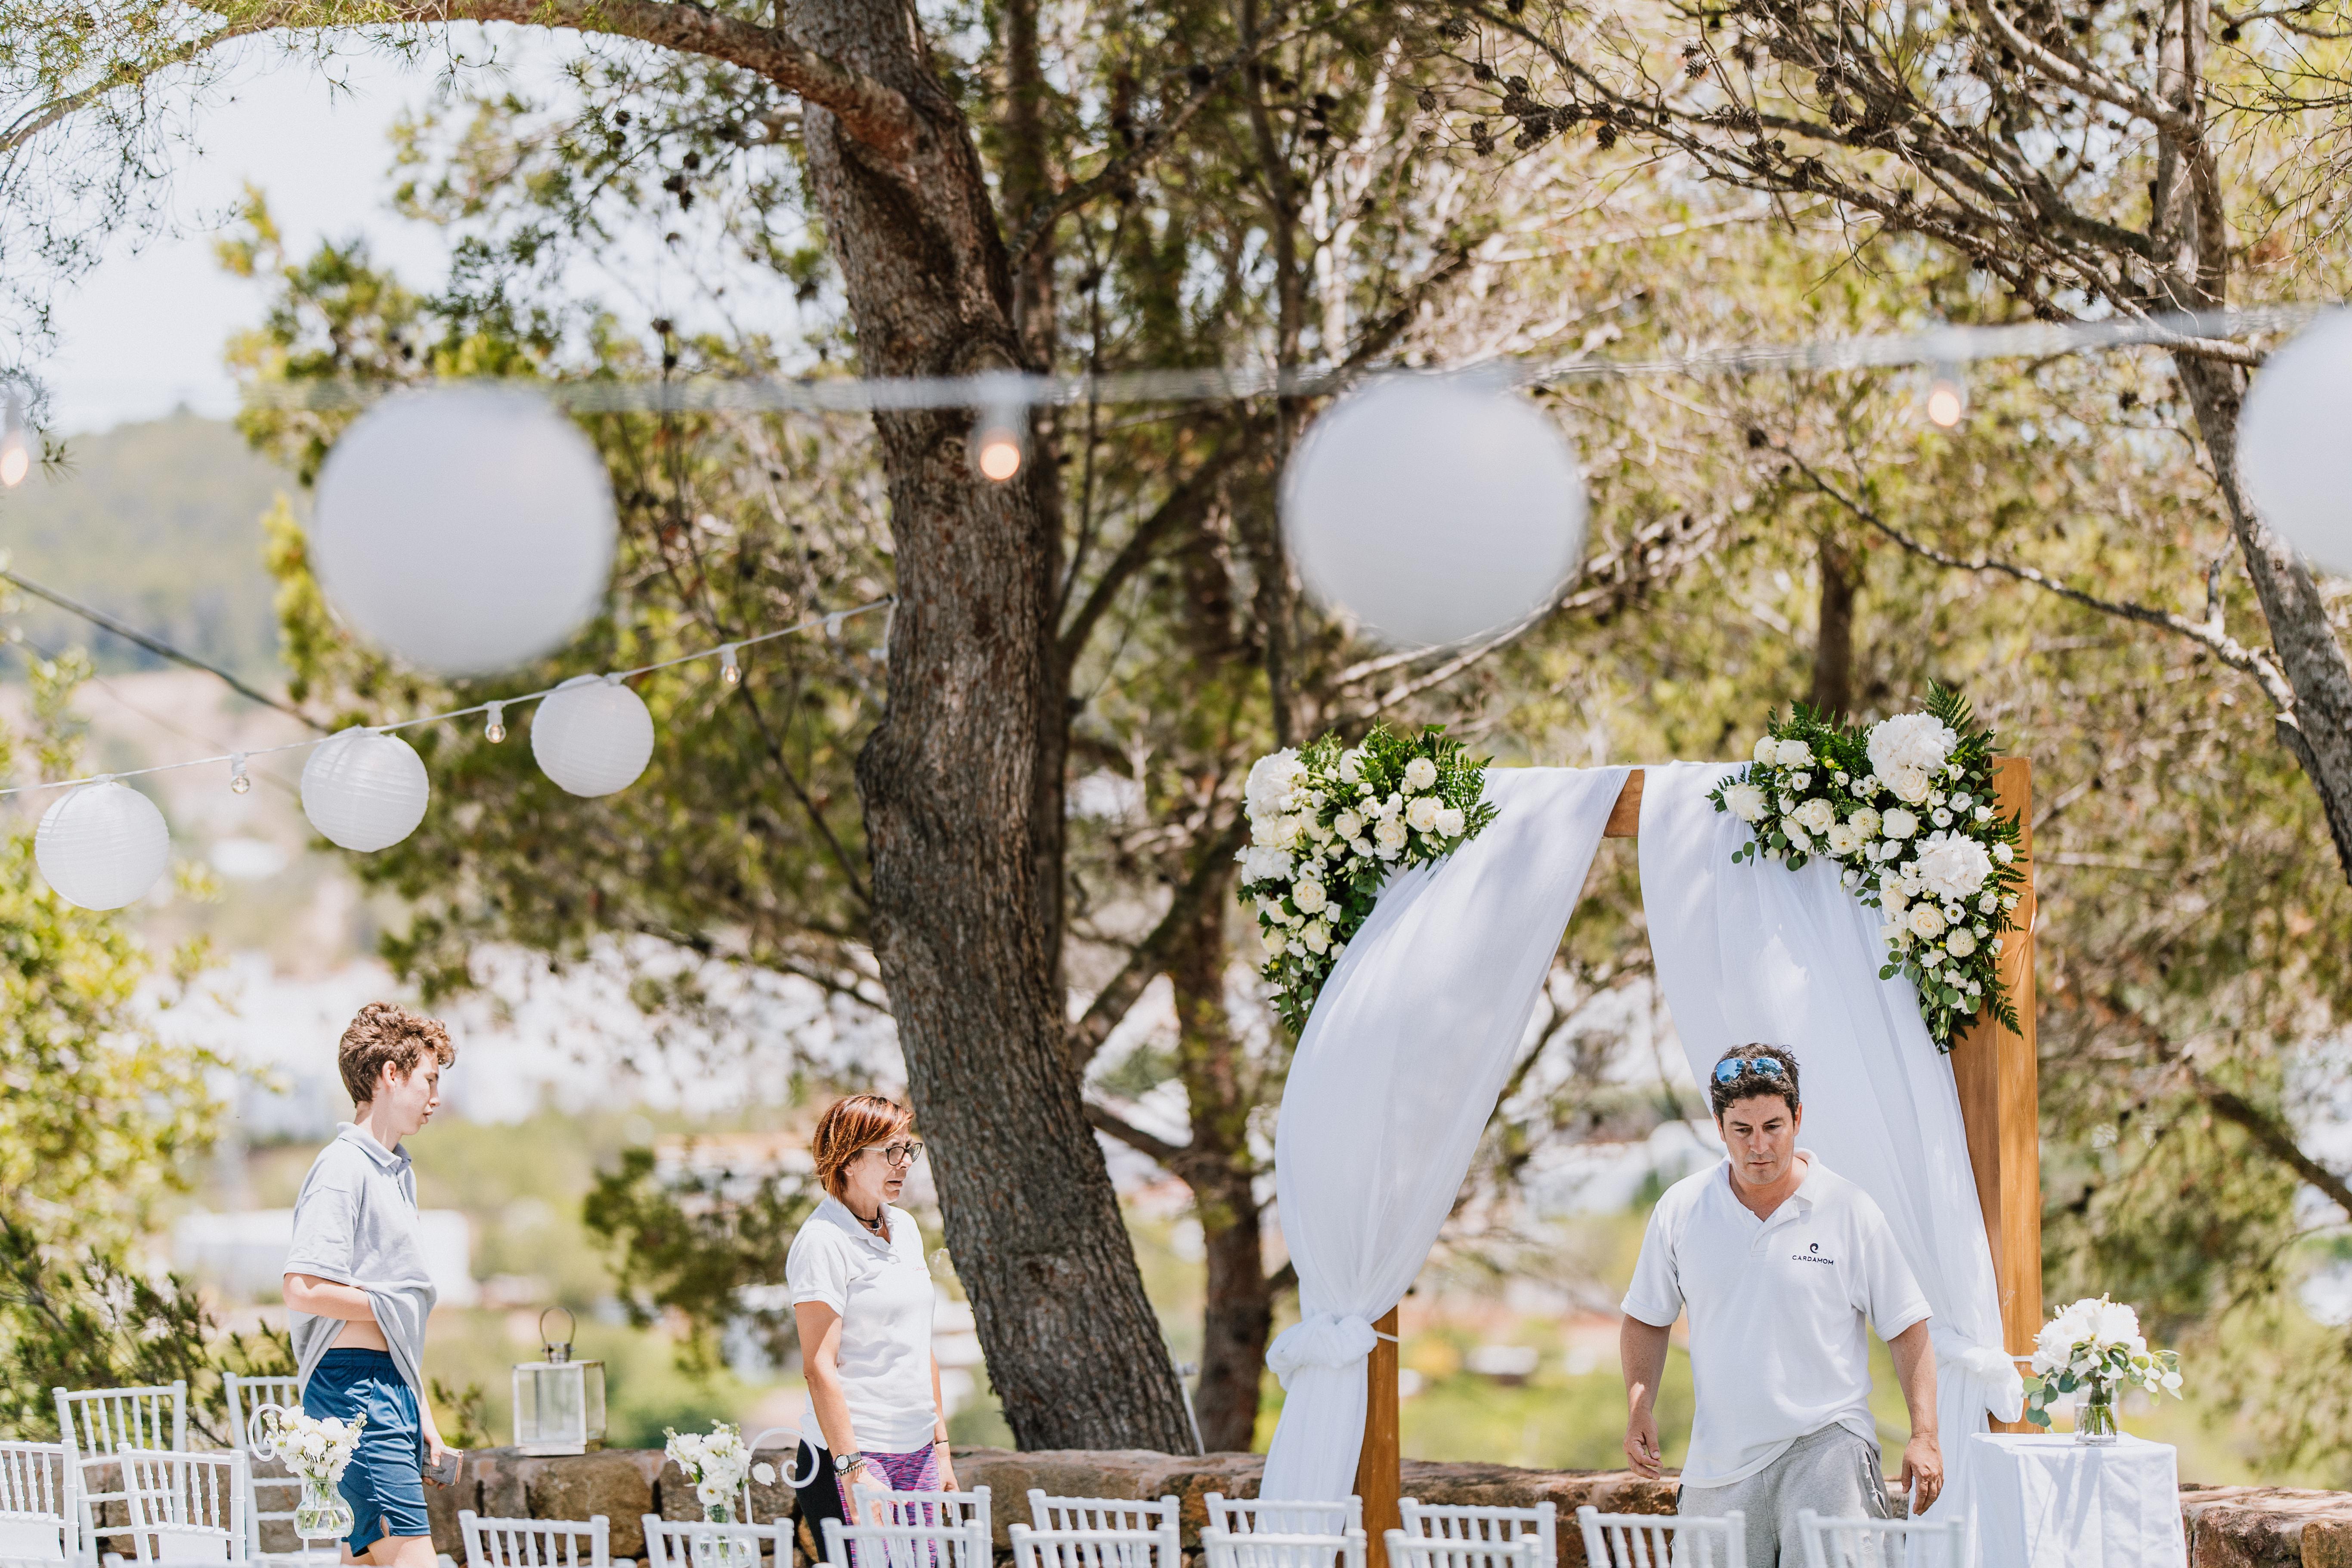 lauren-nick-beziique-destination-wedding-photographer-can-curreu-ibiza-photography0305 2